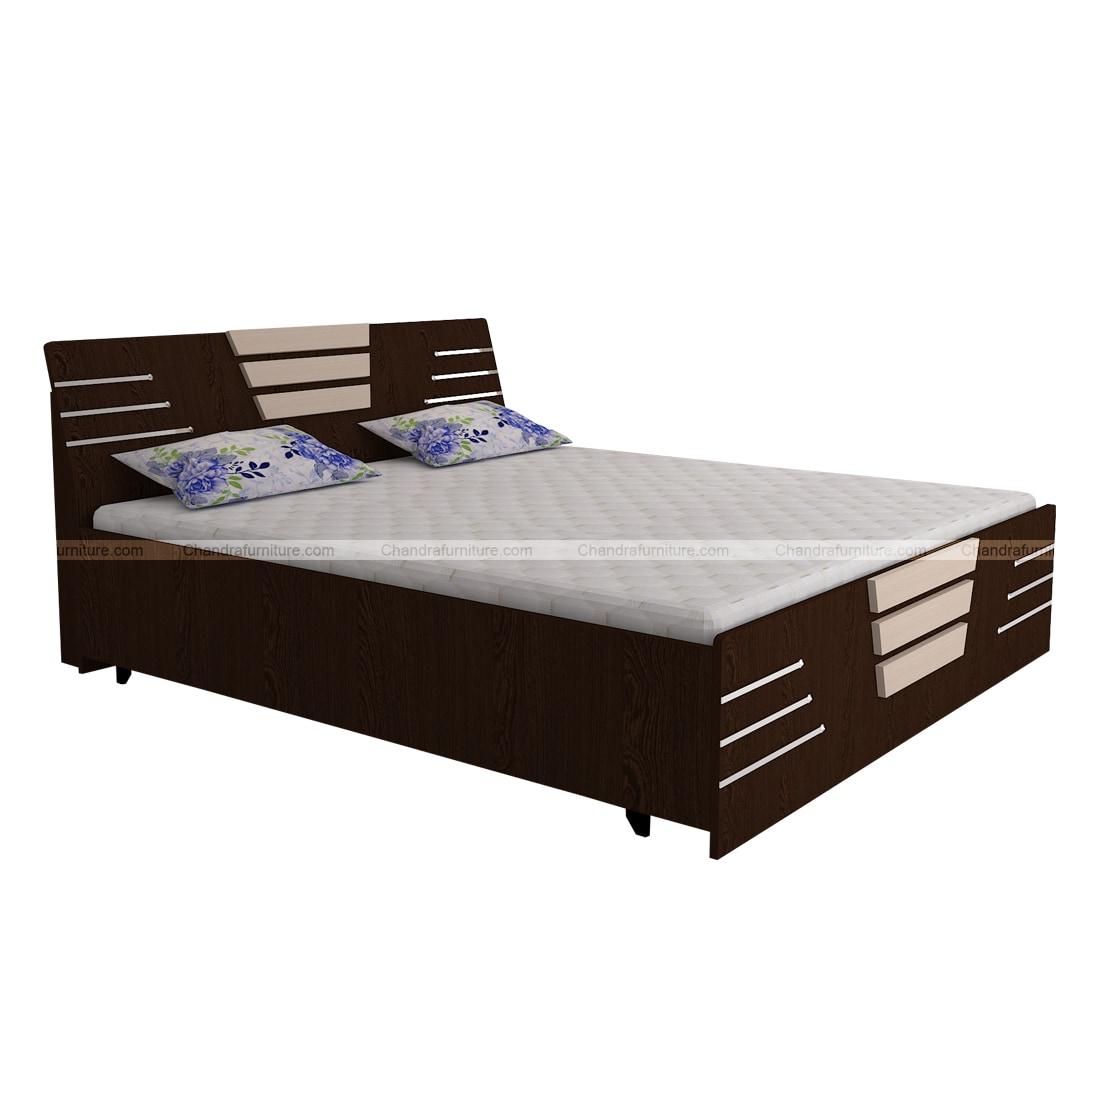 Chandra Furniture King Size Bed-25 Viva